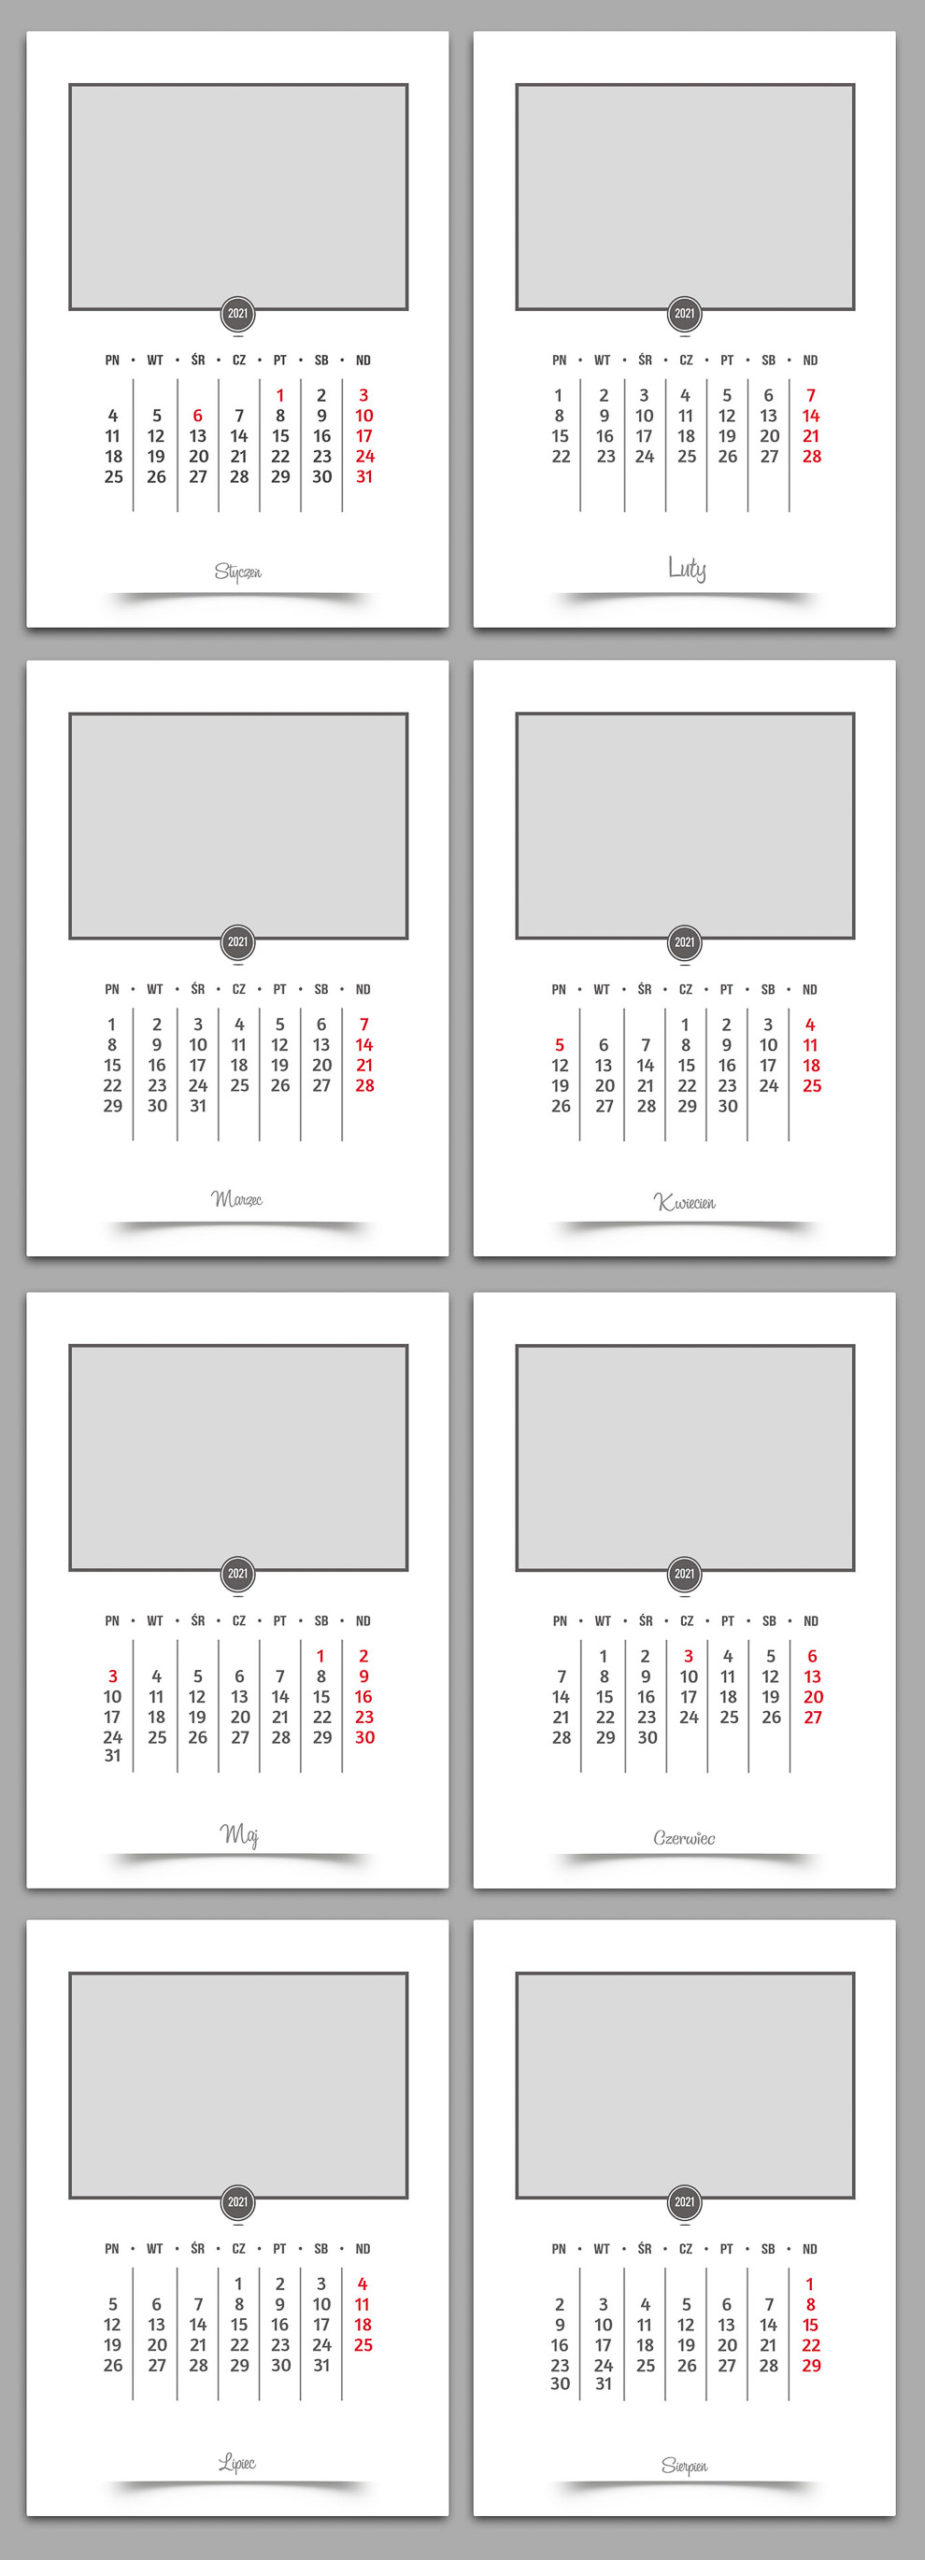 biały prosty i elegancki projekt kalendarza